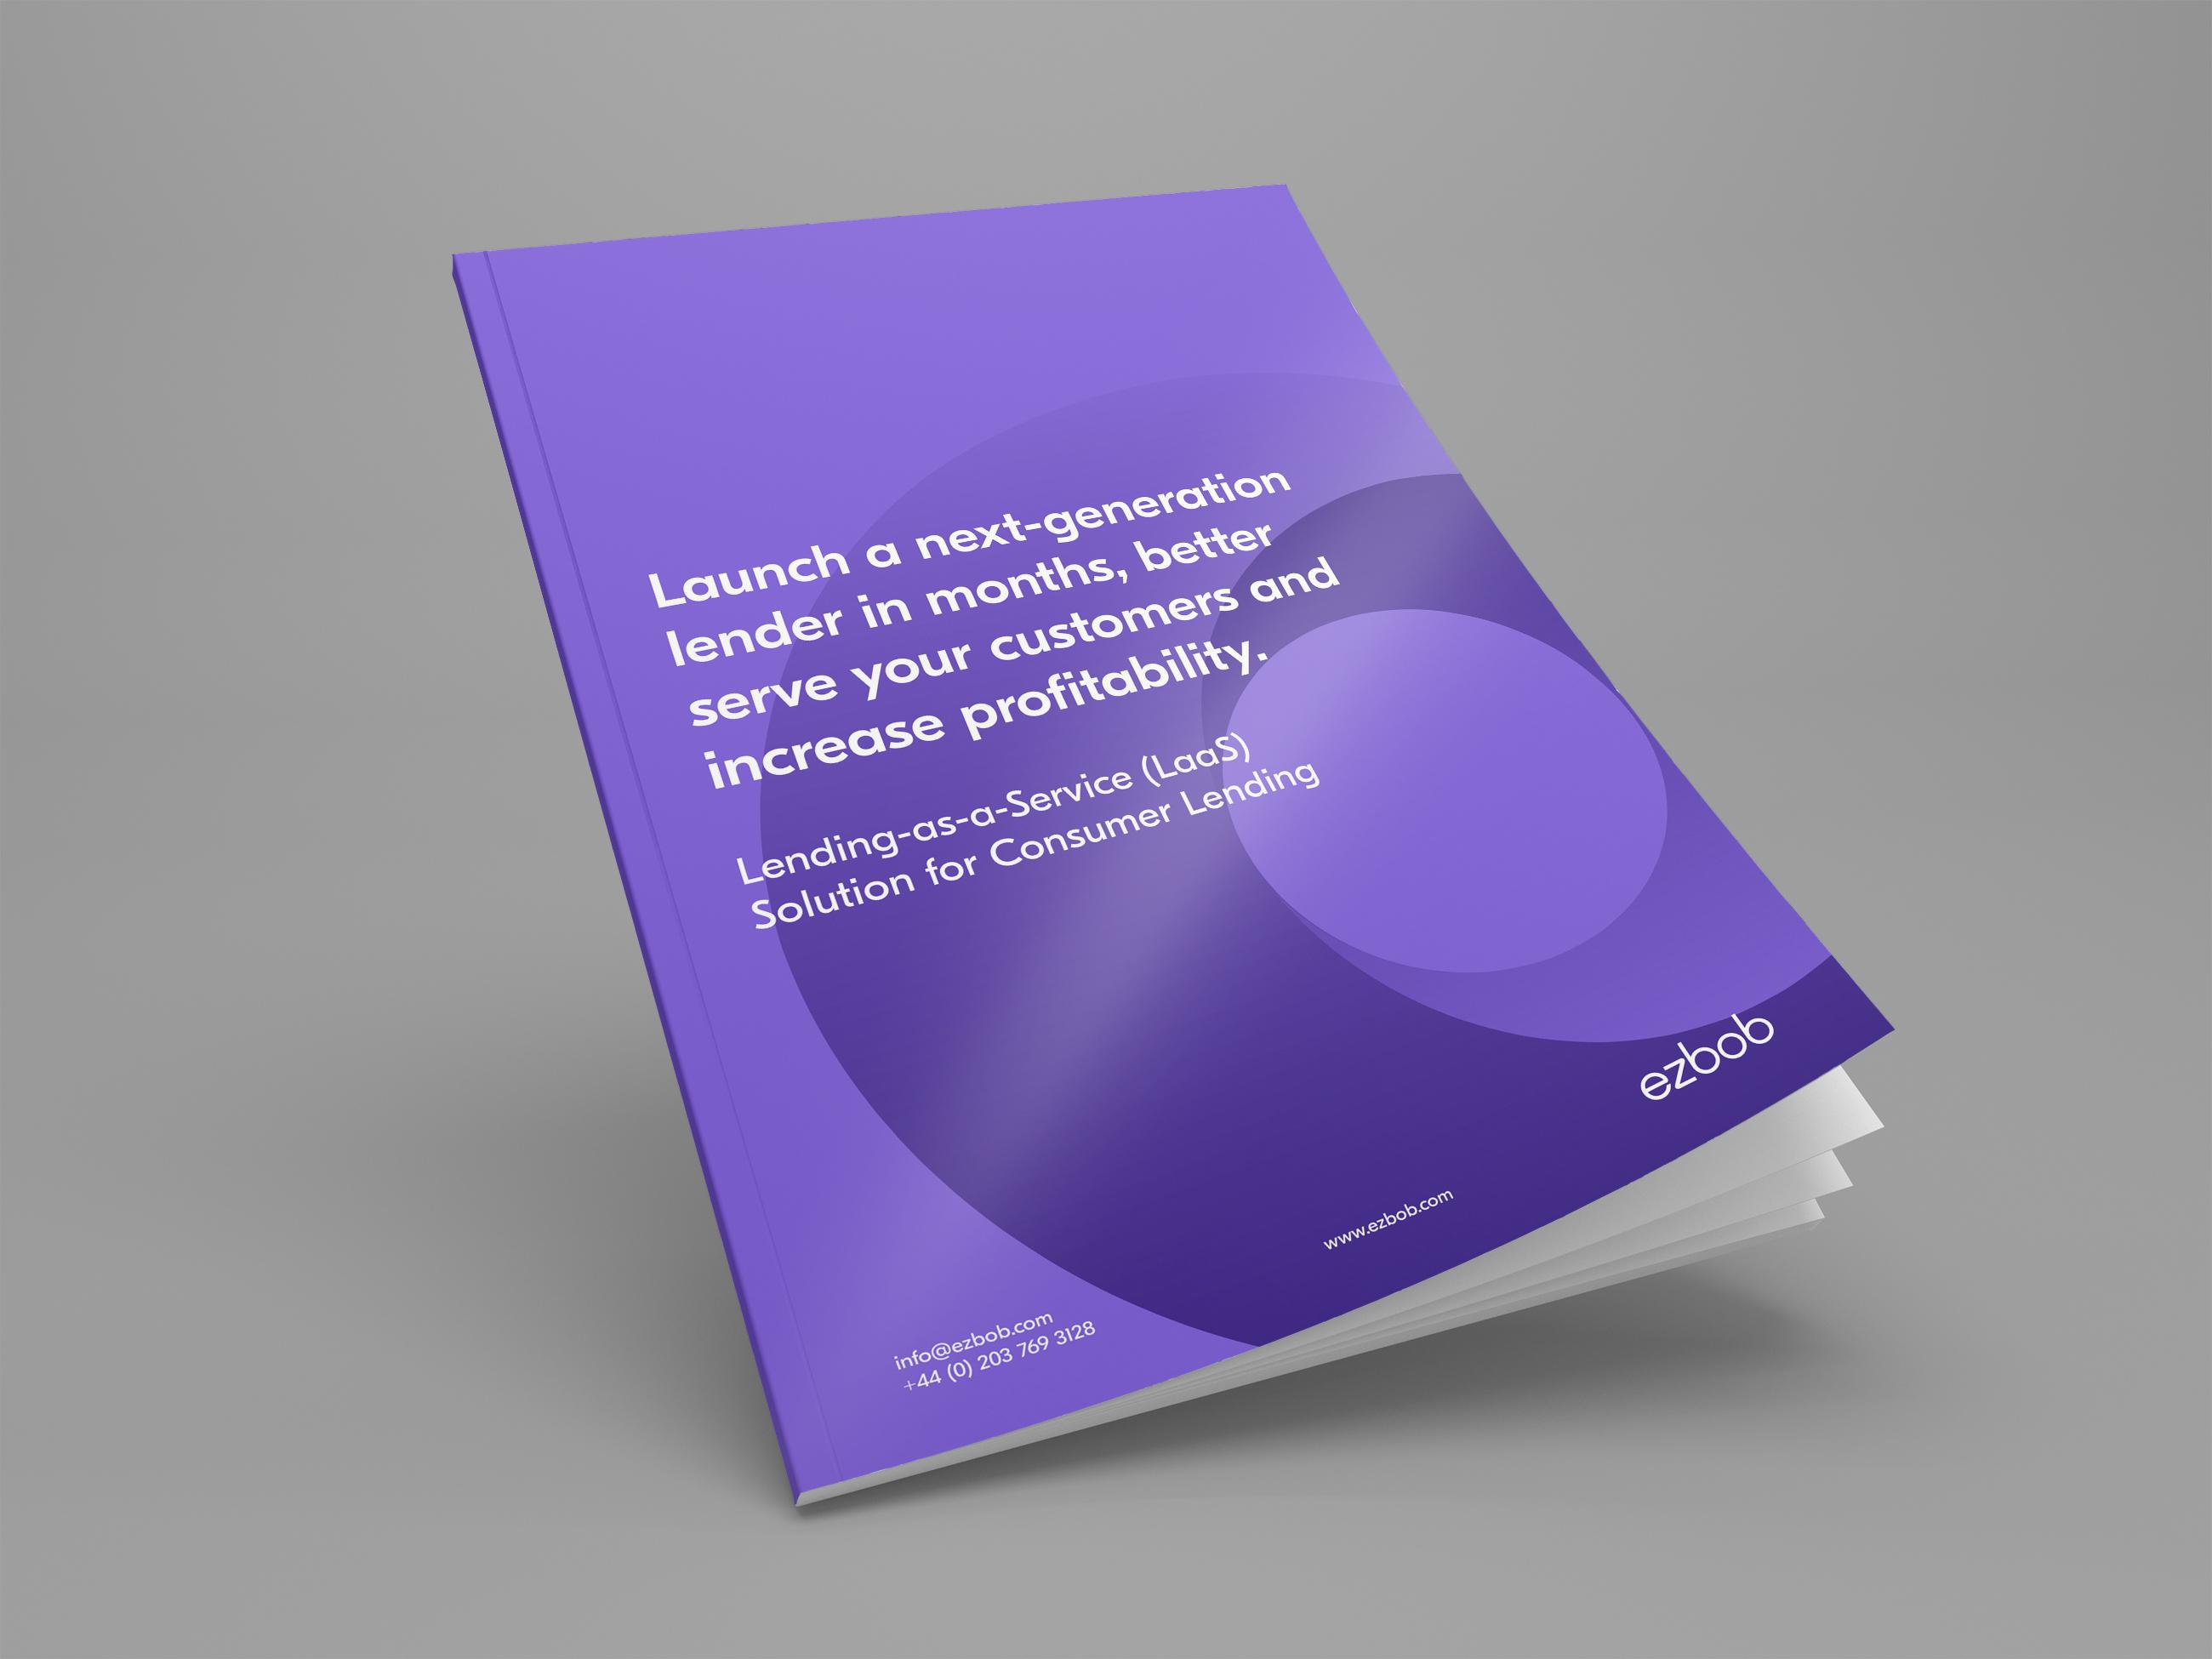 ezbob brochure - Consumer Lending cover